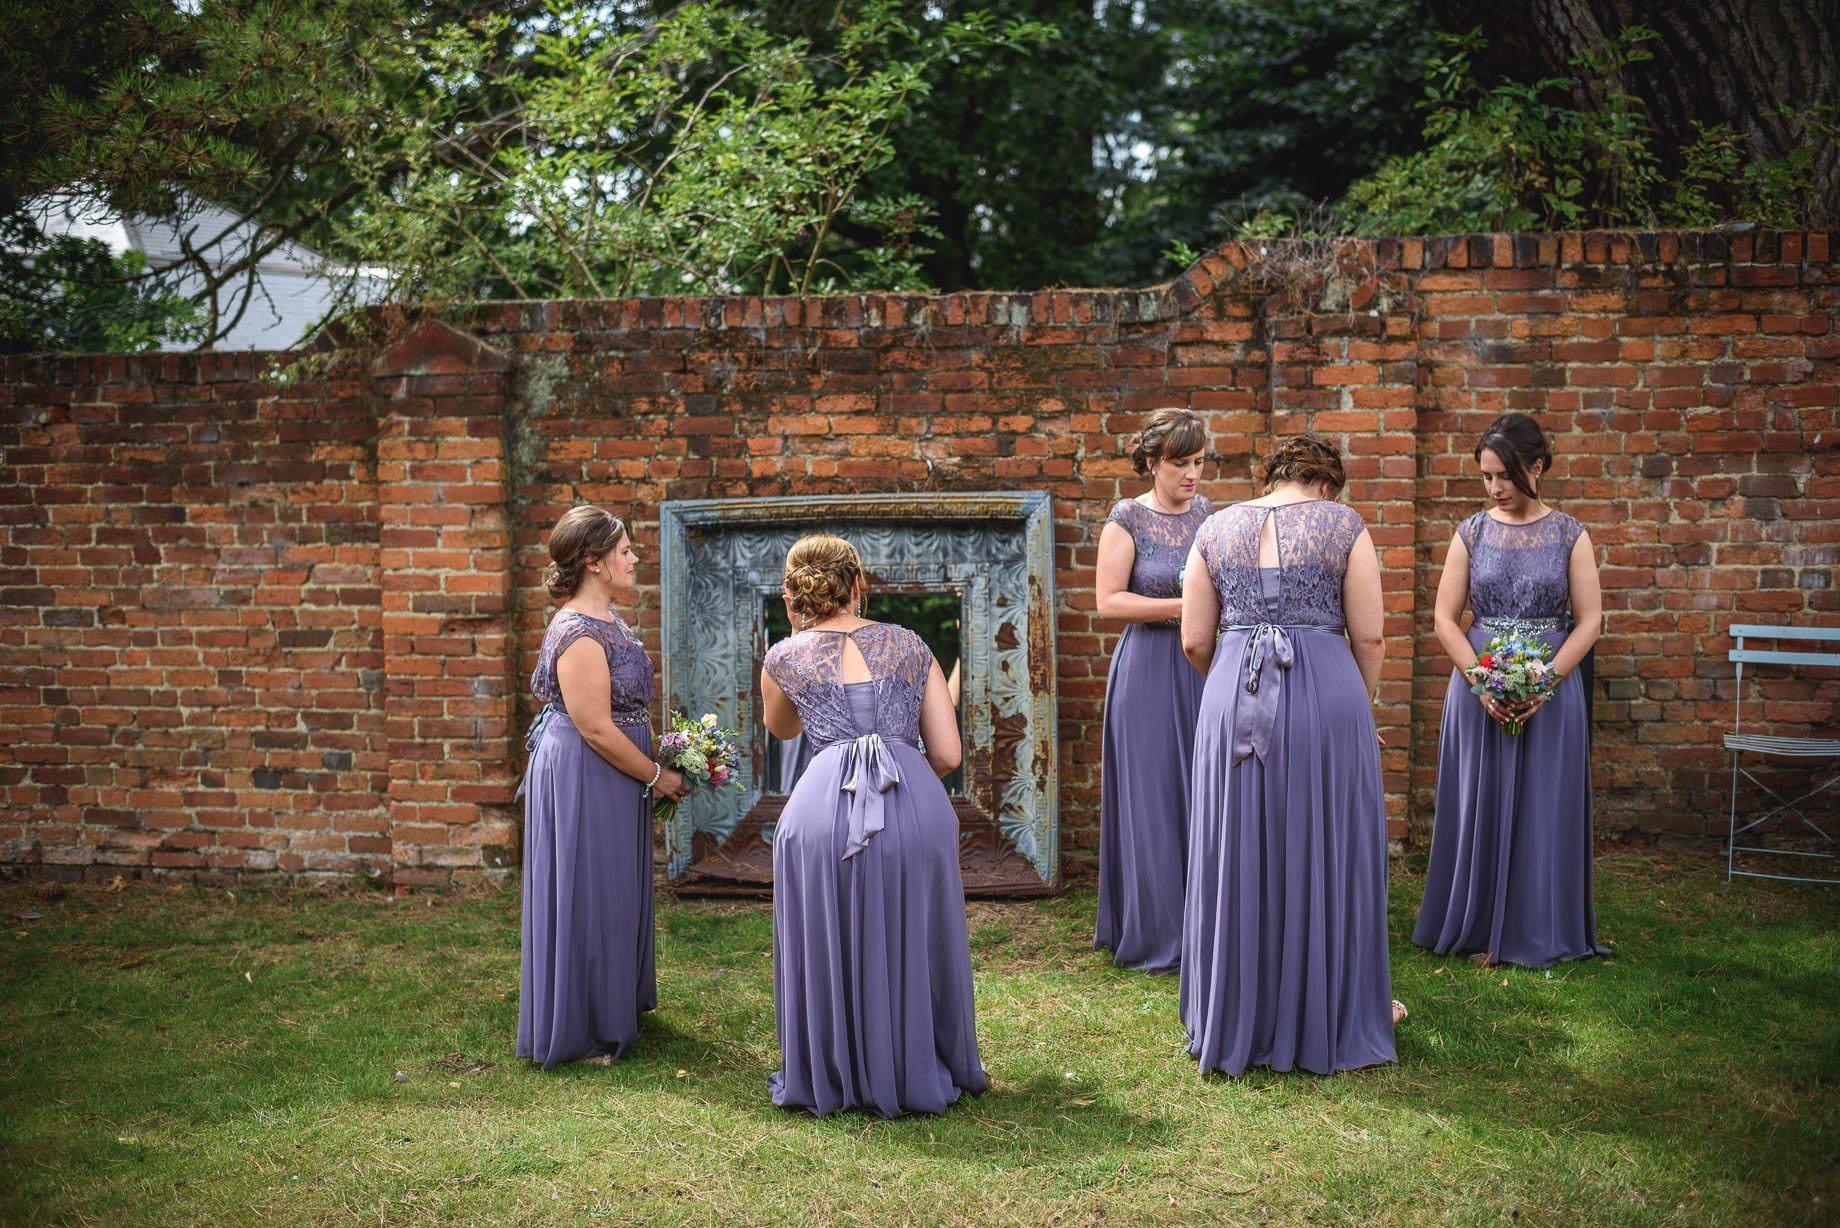 Gaynes Park wedding photography - Guy Collier Photography - Rachel and Jon (56 of 169)